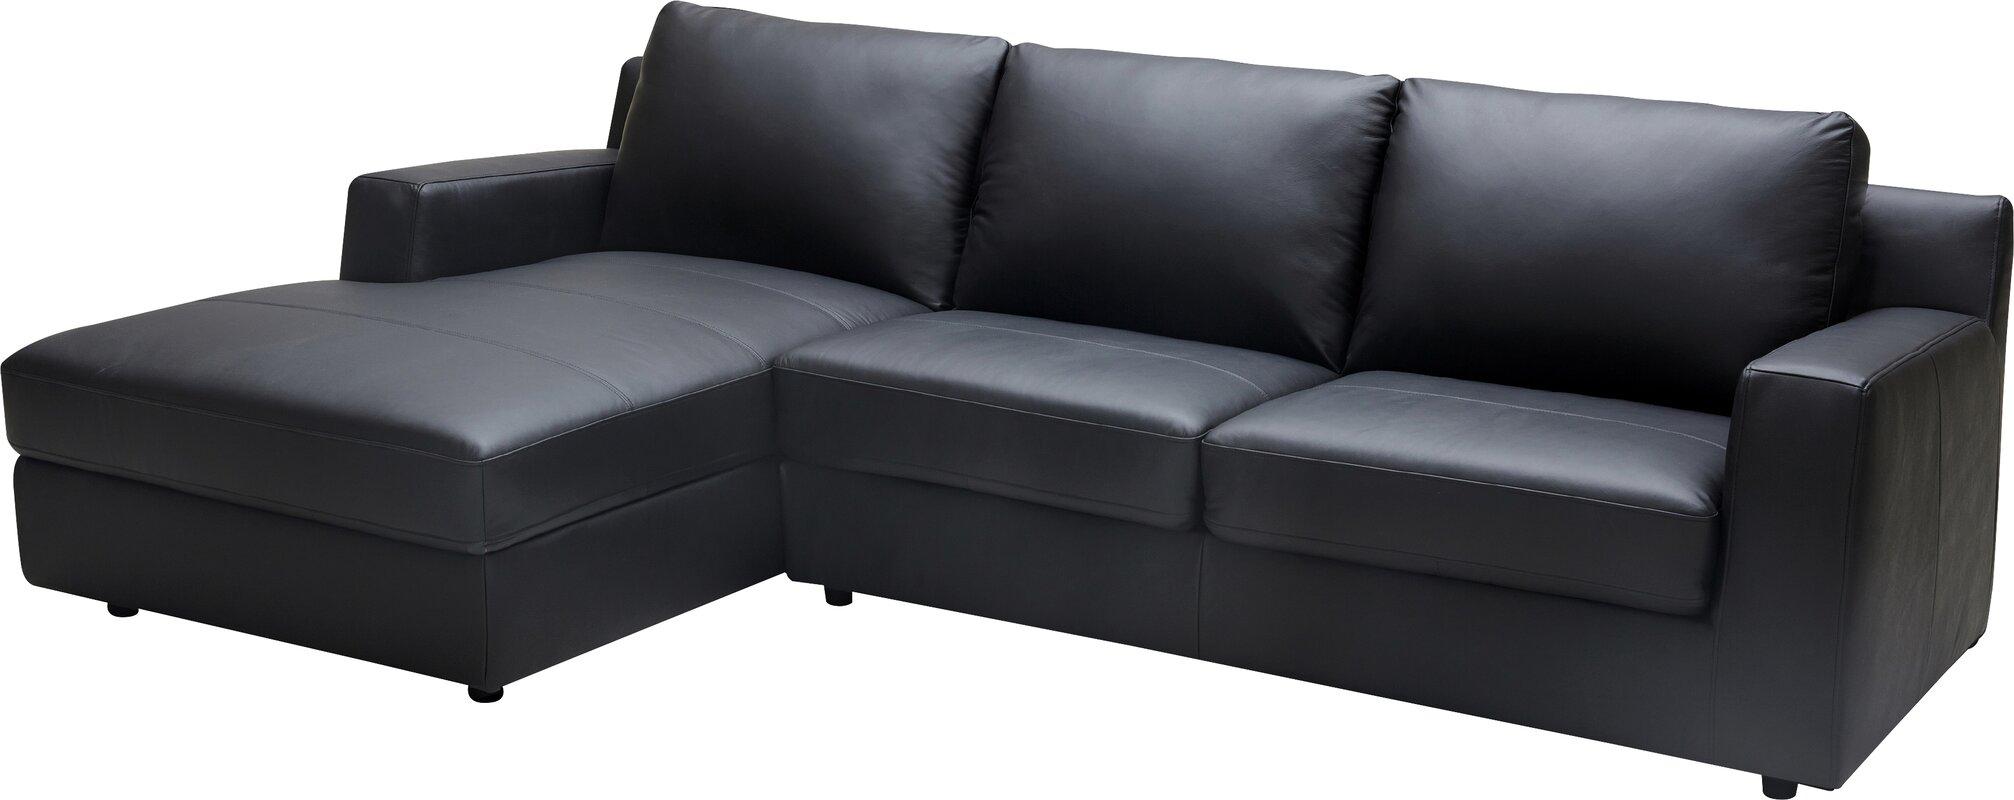 Leather Sleeper Sectional